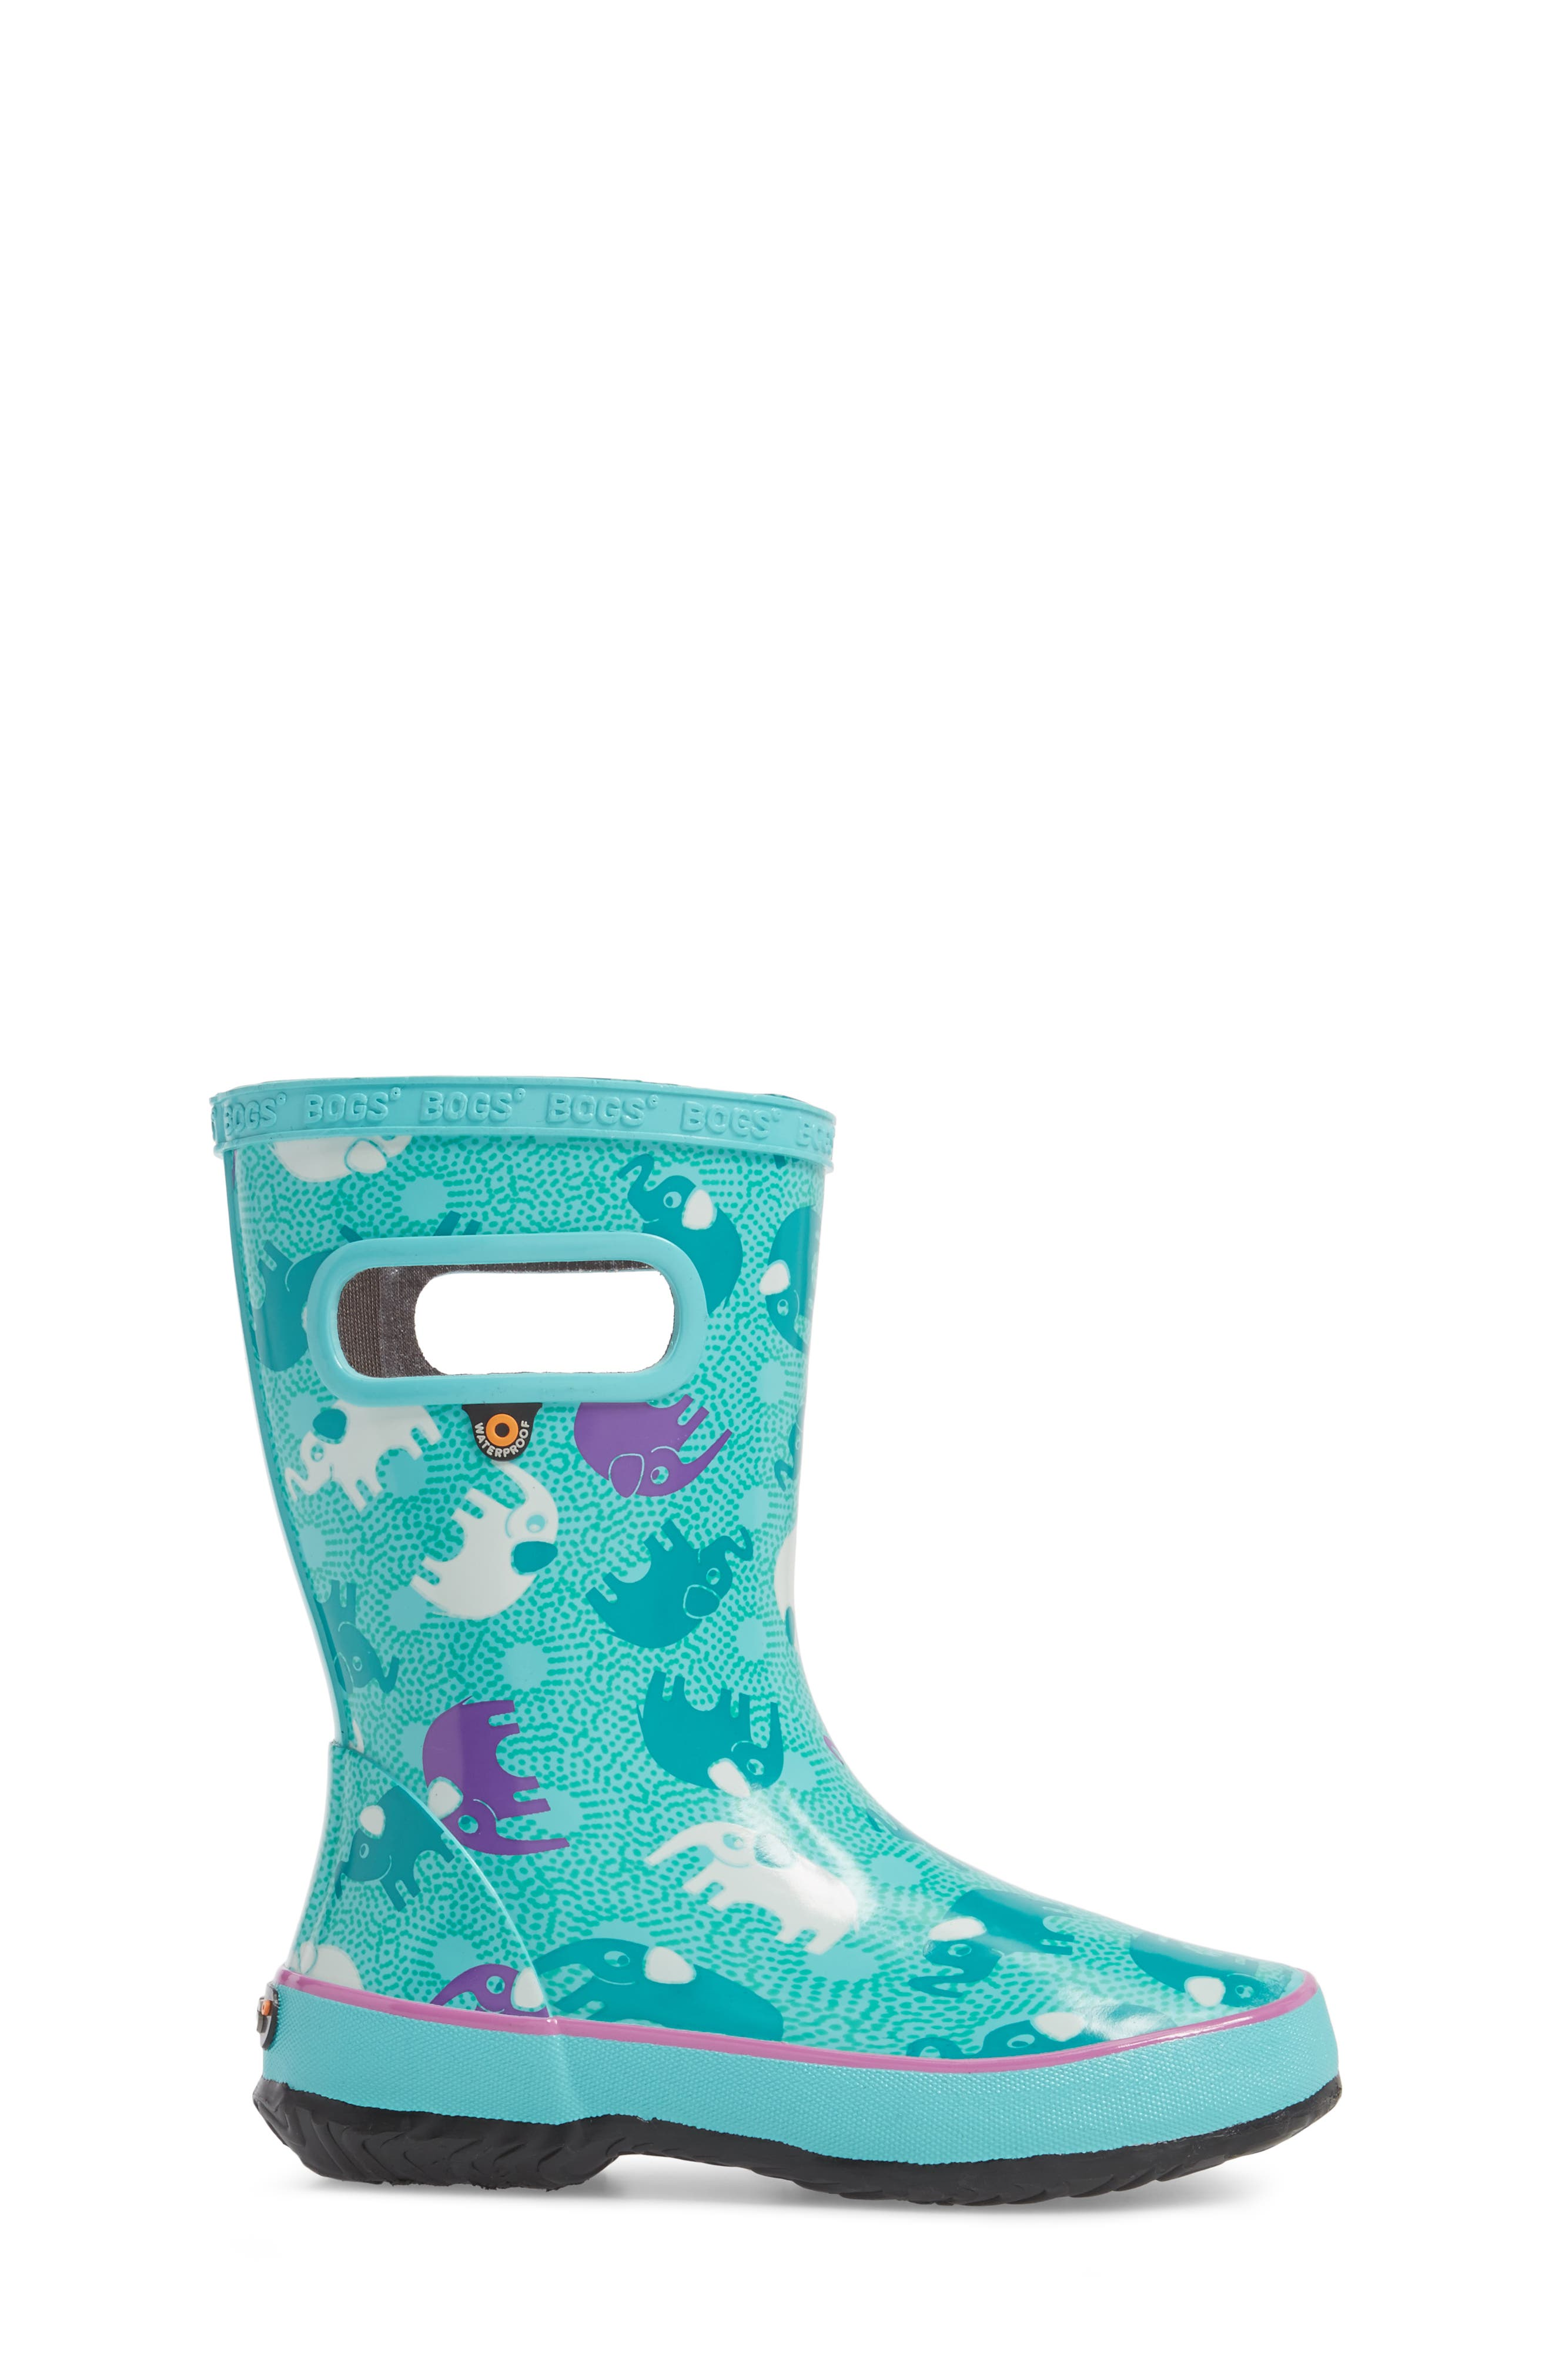 BOGS, Skipper Elephant Print Rubber Waterproof Rain Boot, Alternate thumbnail 3, color, TURQUOISE MULTI